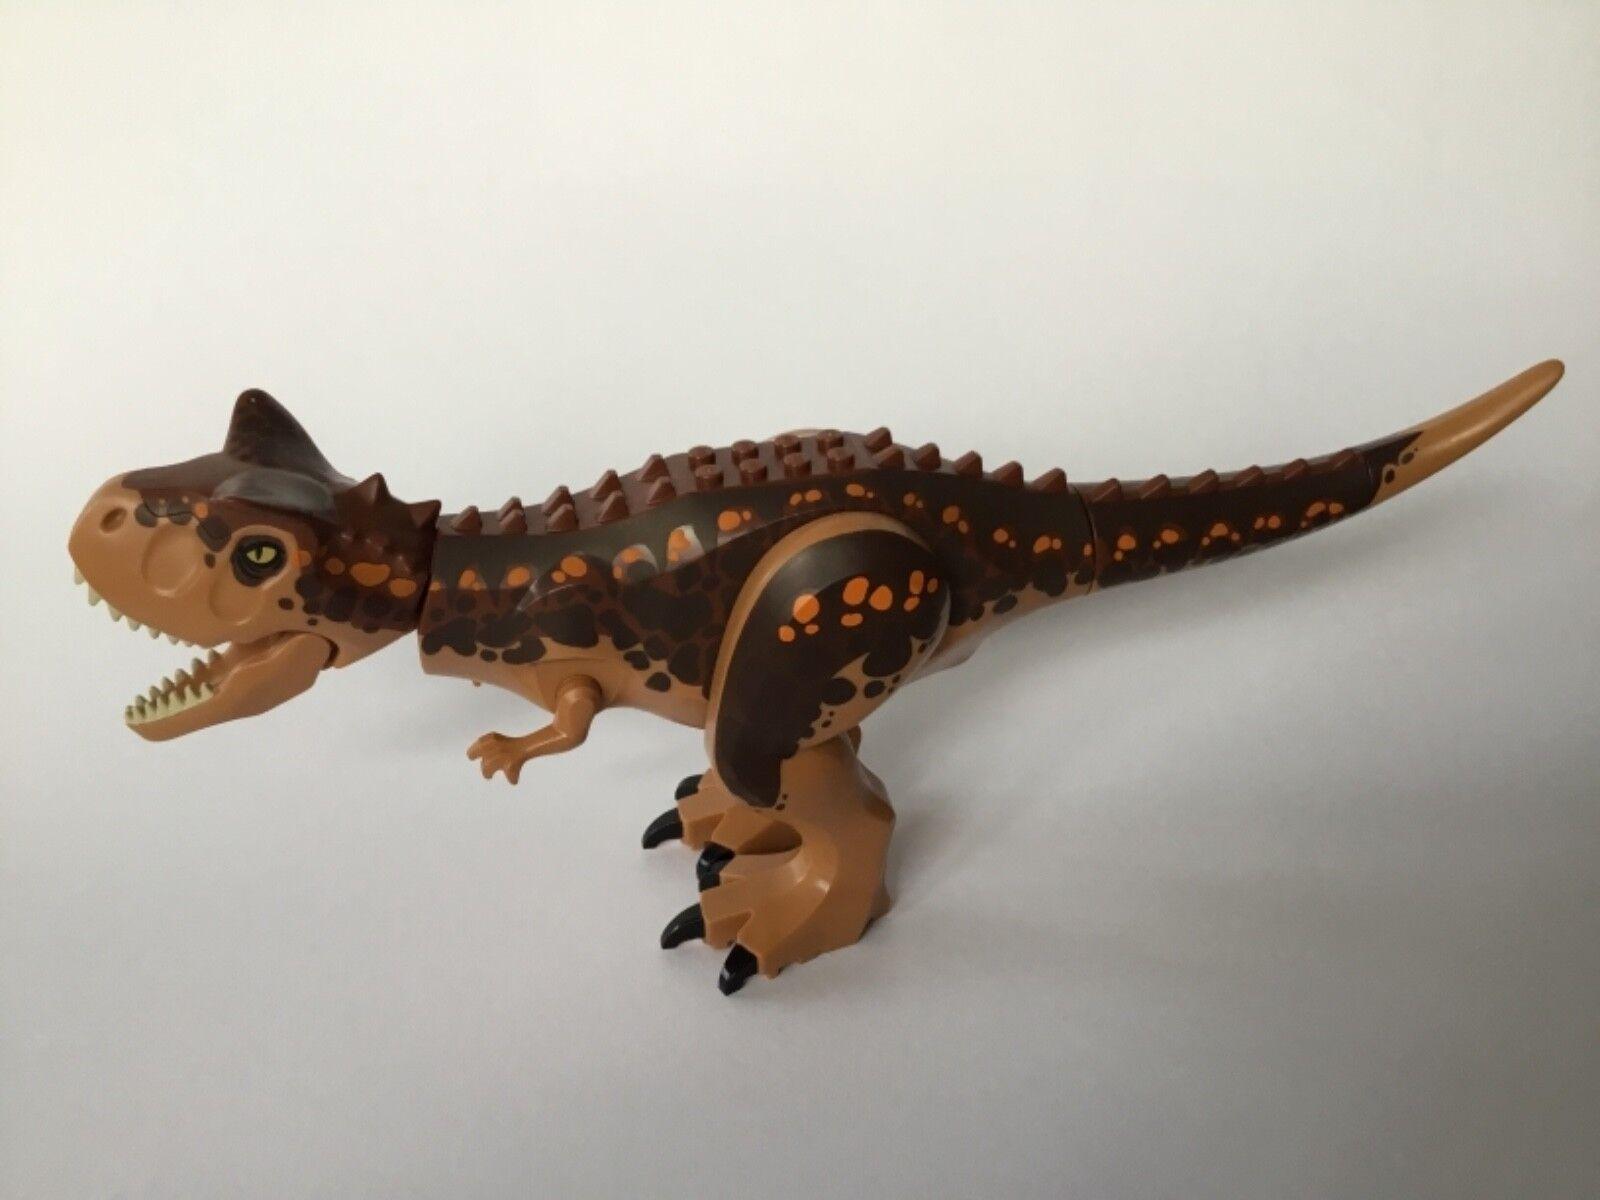 Lego Carnotaurus Dinosaurier aus 75929 NEU Jurassic World